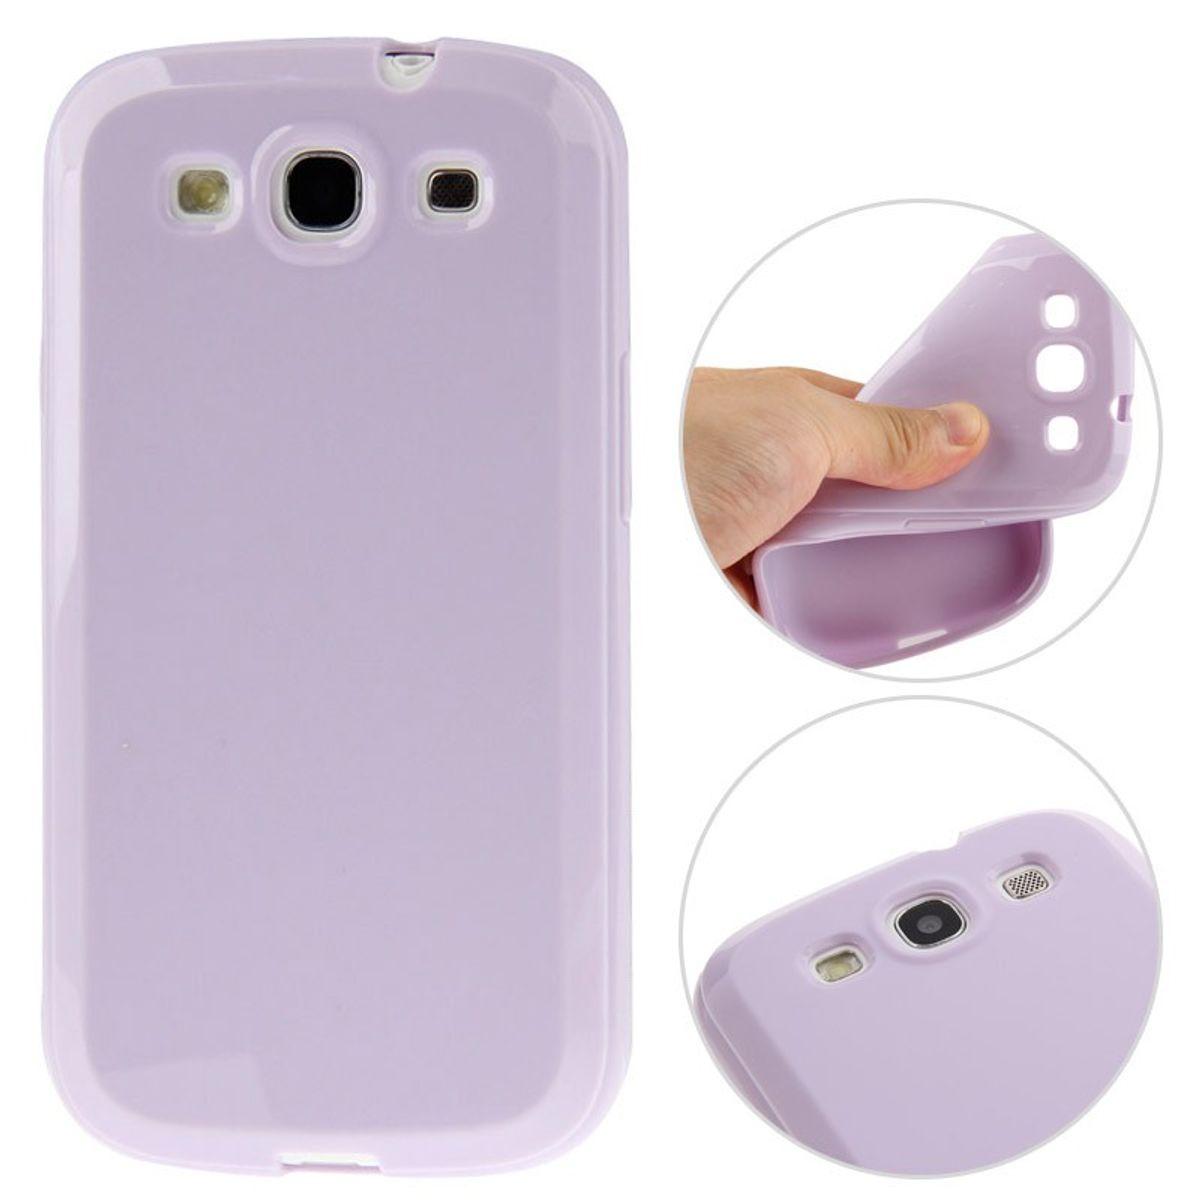 Schutzhülle TPU Case für Handy Samsung I9300 Galaxy S3 lila/violett